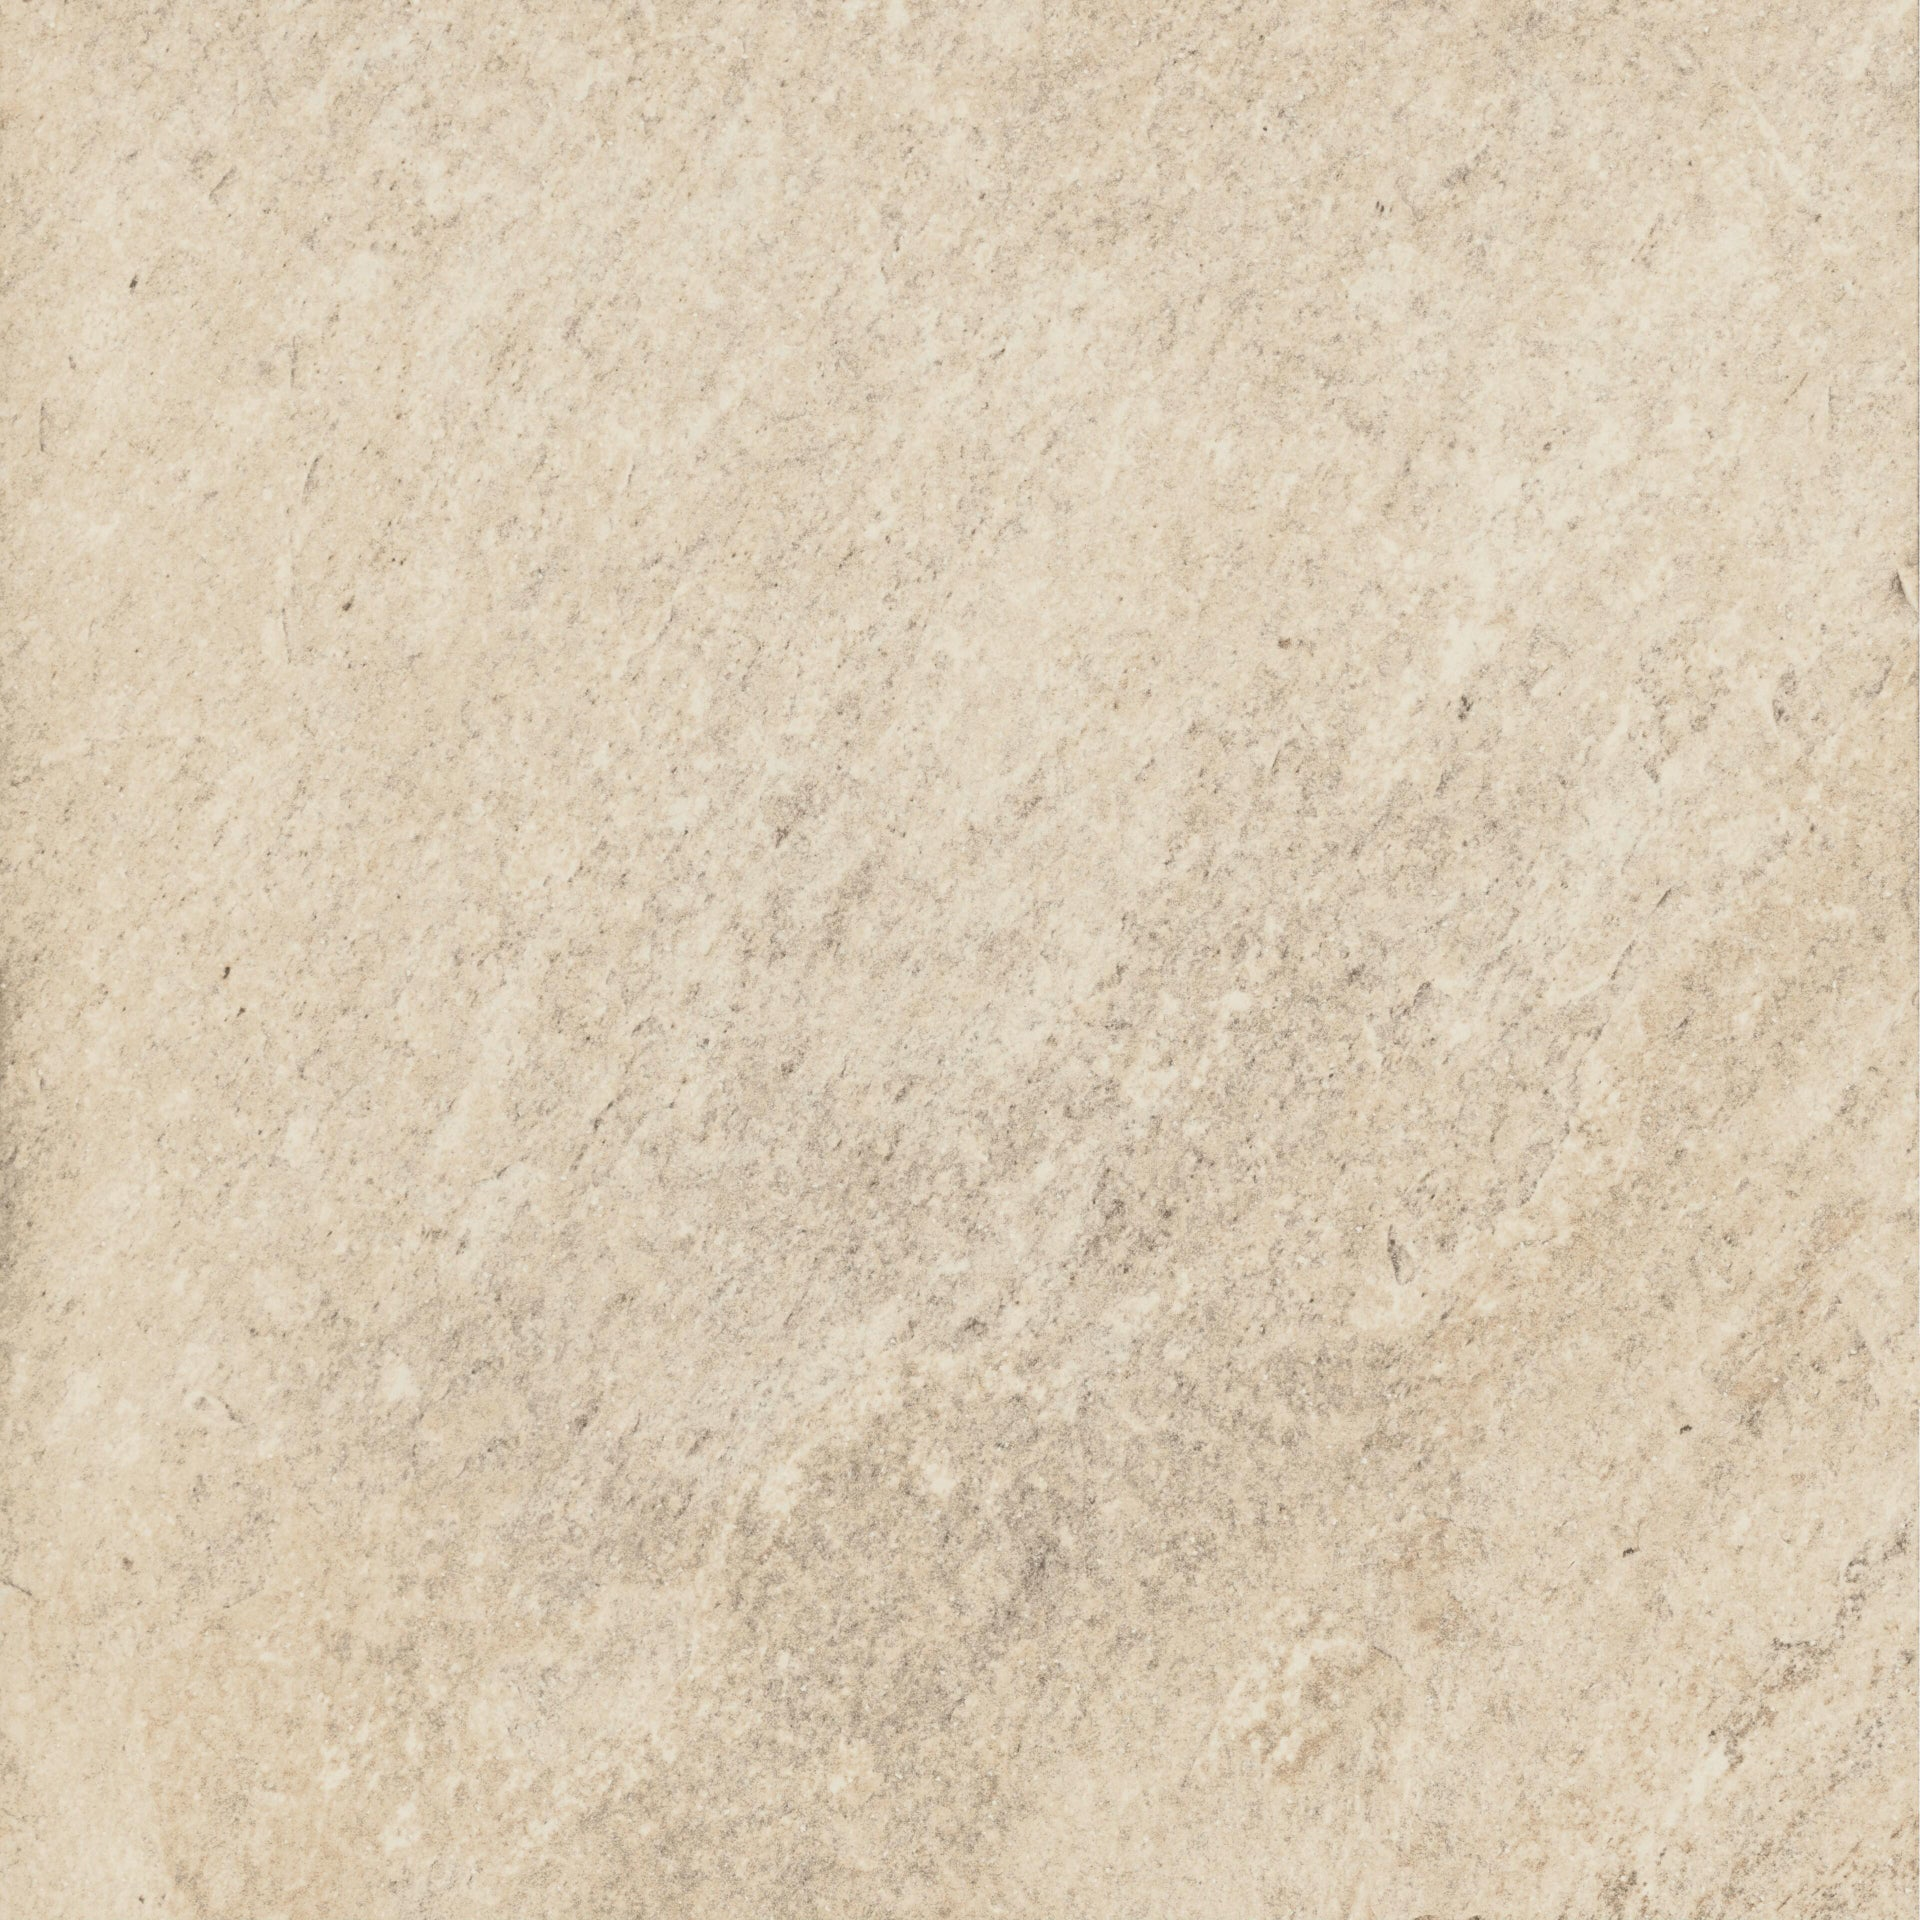 Piastrella da pavimento Walk 32.5 x 32.5 cm sp. 9 mm PEI 3/5 beige - 4